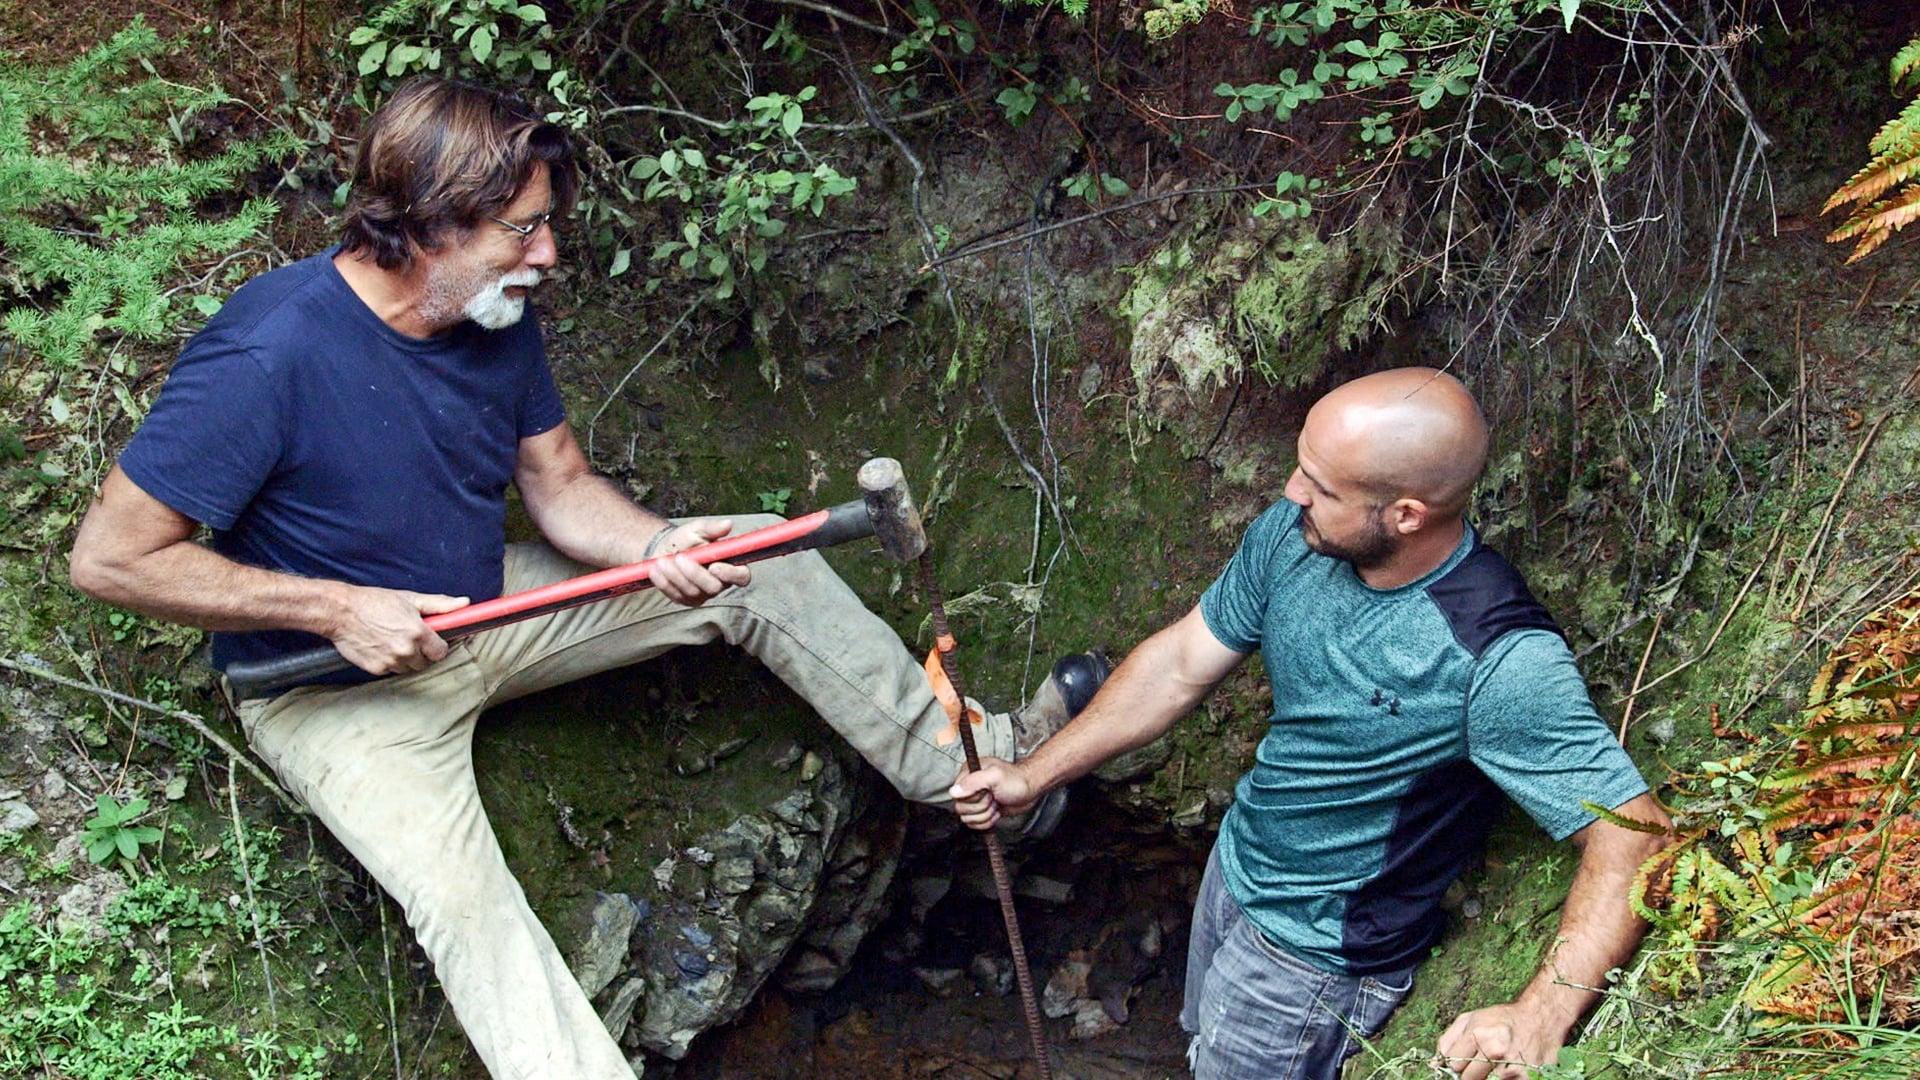 The Curse Of Oak Island Season  Episodes Online Free